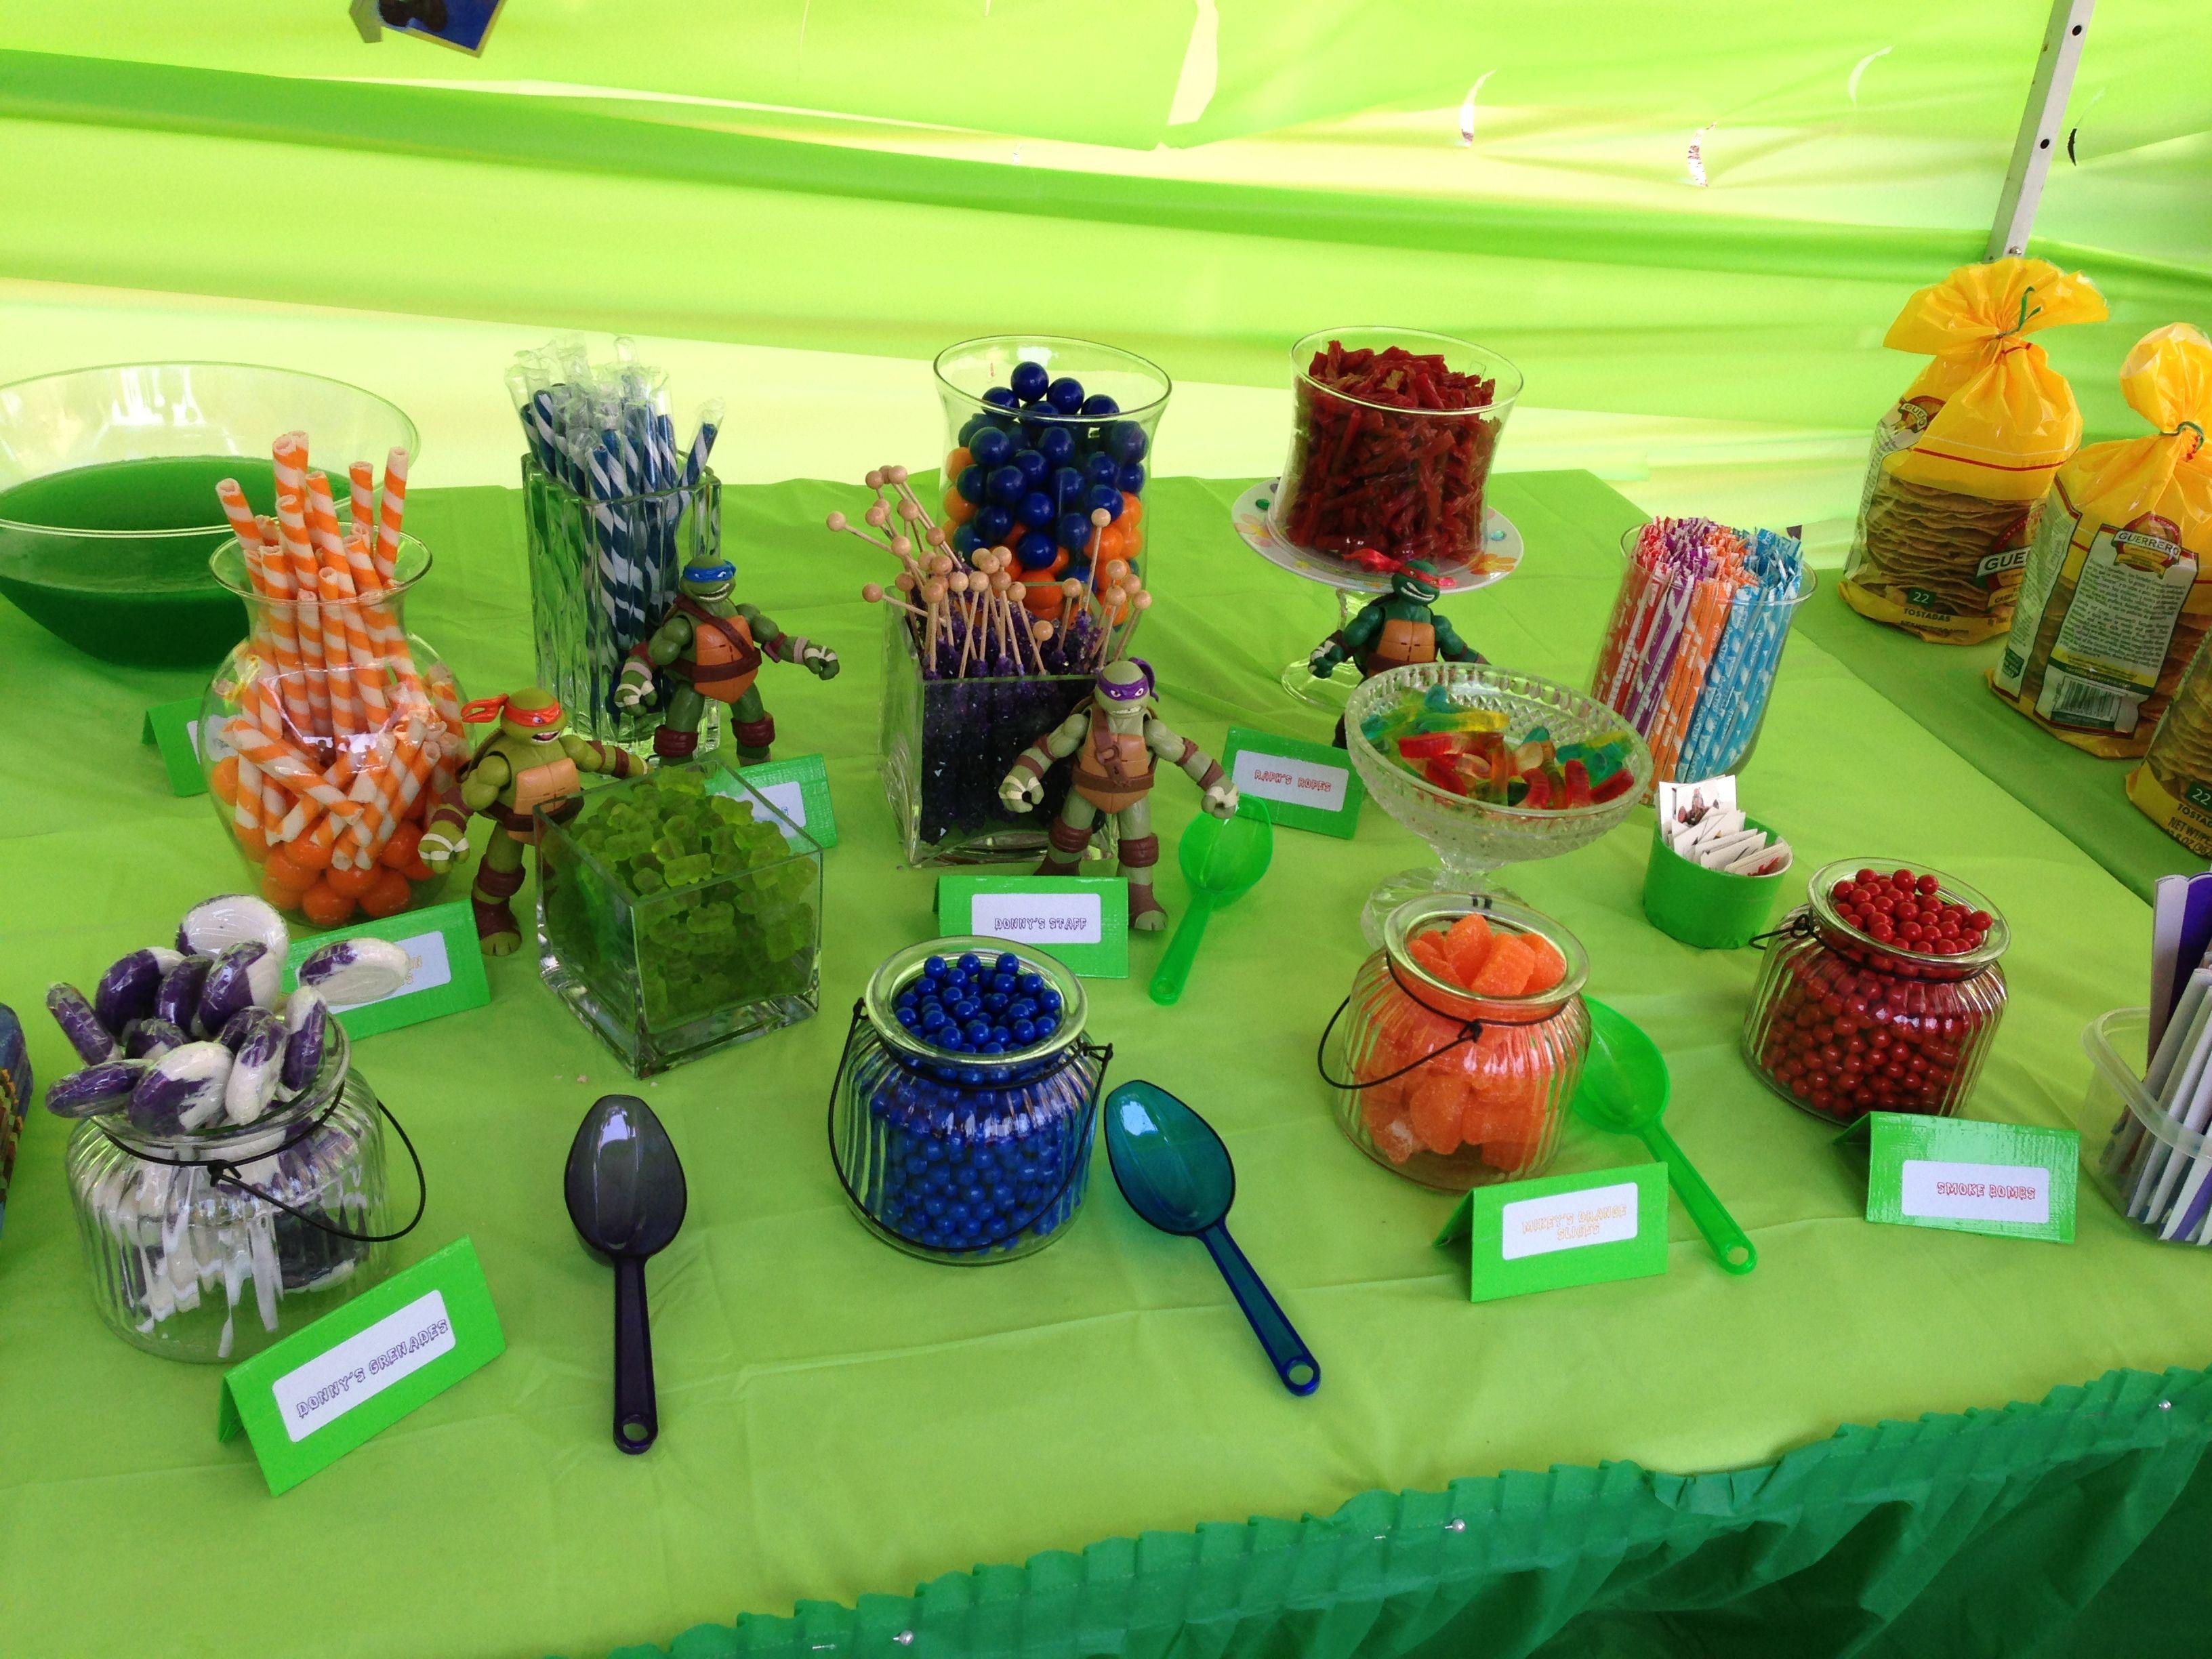 Pin By Haley Eaton On Celiana S Birthday Tmnt Party Ninja Party Ninja Turtle Party